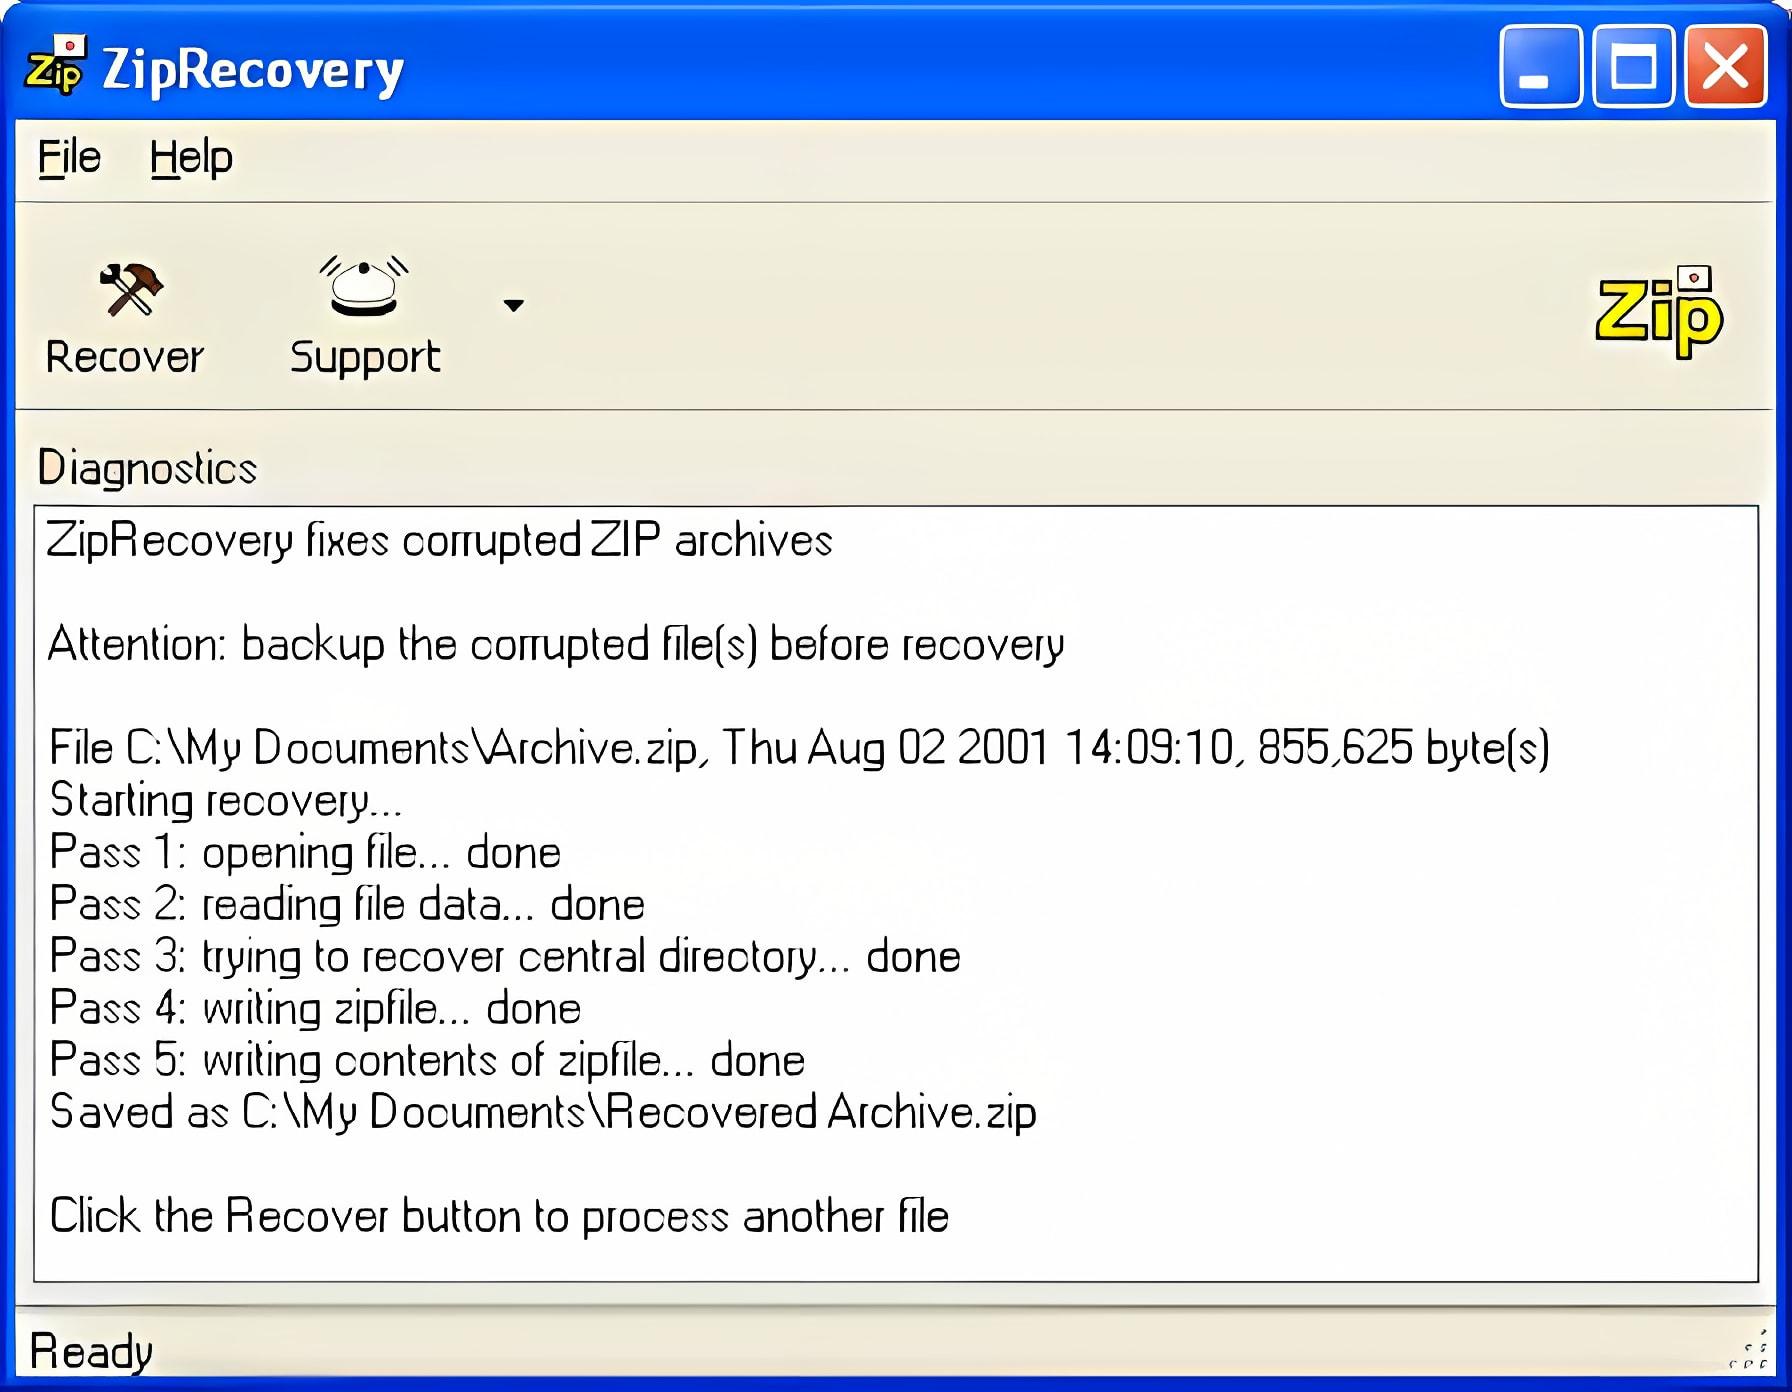 ZipRecovery